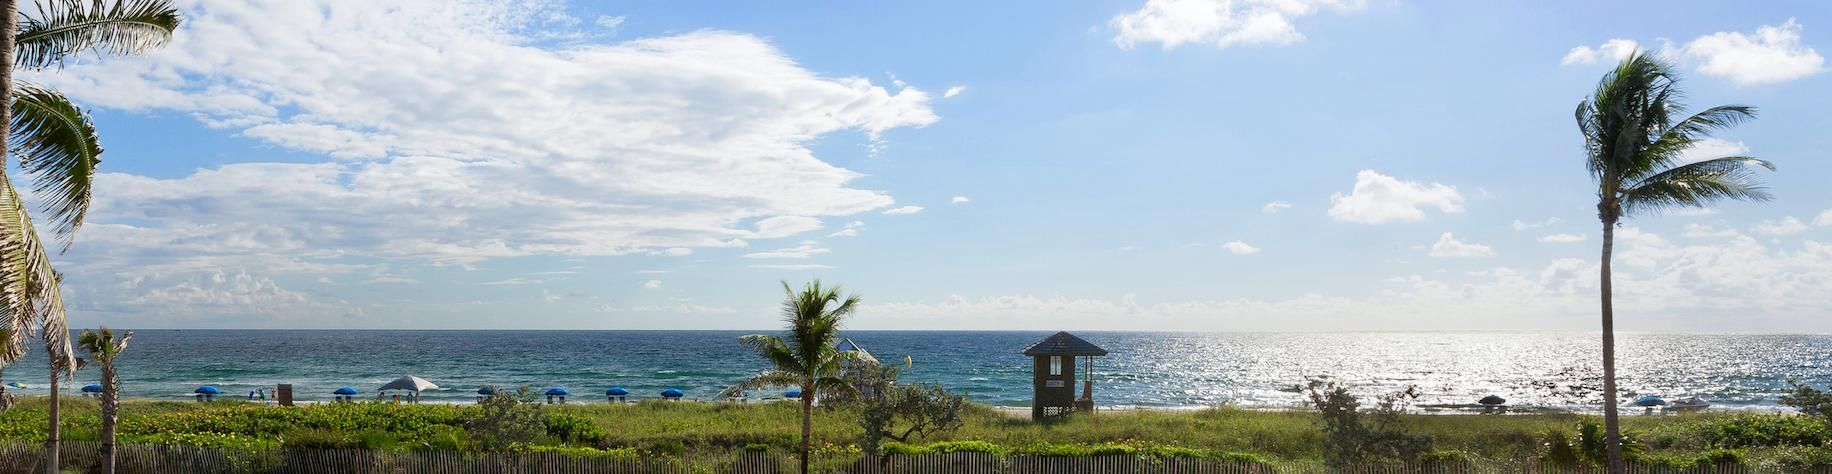 220 South Ocean Boulevard Delray Beach, FL 33483 photo 47